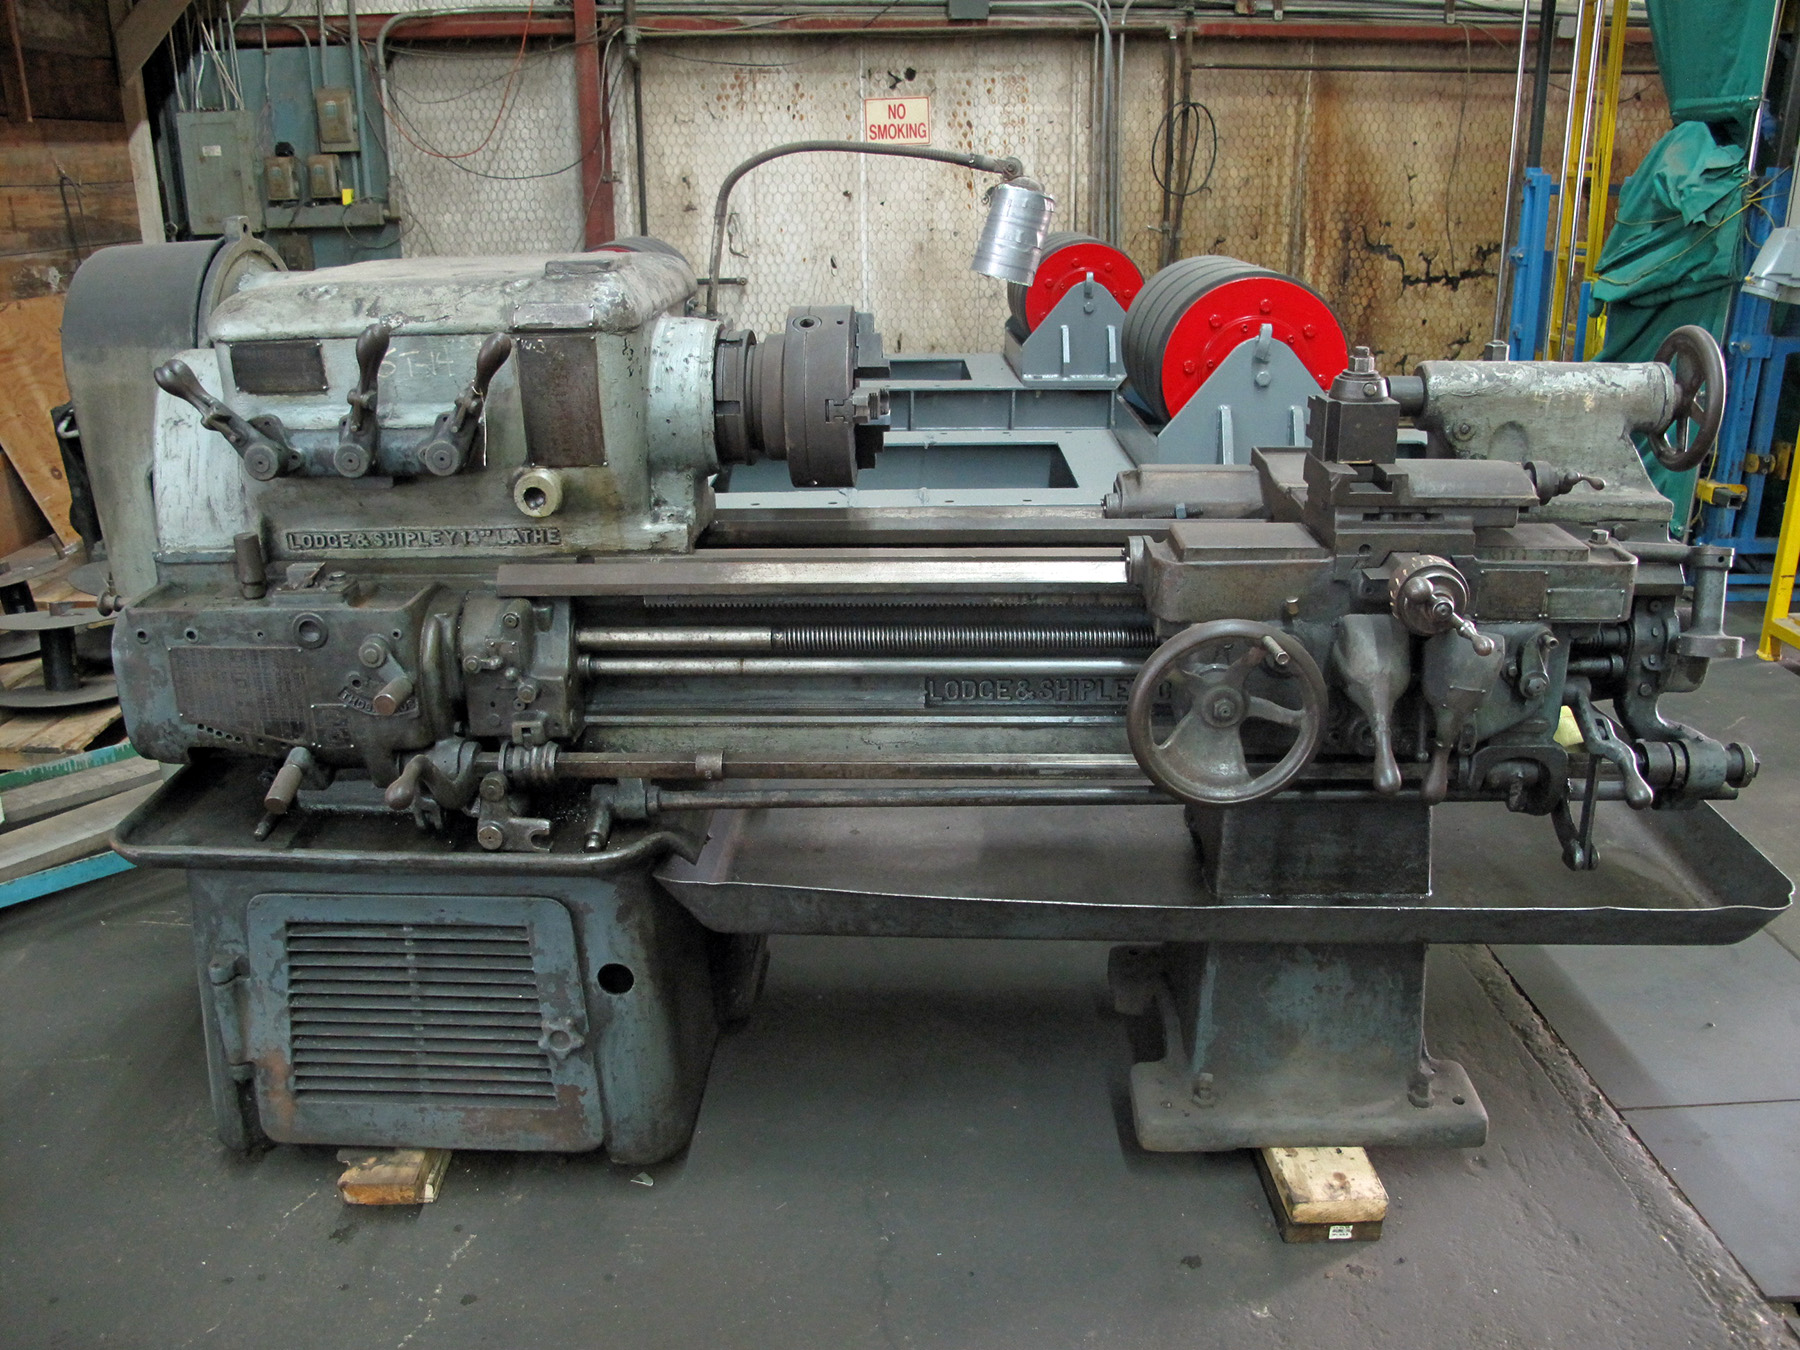 engine lathe lodge shipley 14 x 30 10 over crosslide spds rh bidspotter com lodge & shipley lathe parts Lodge and Shipley Lathe Parts